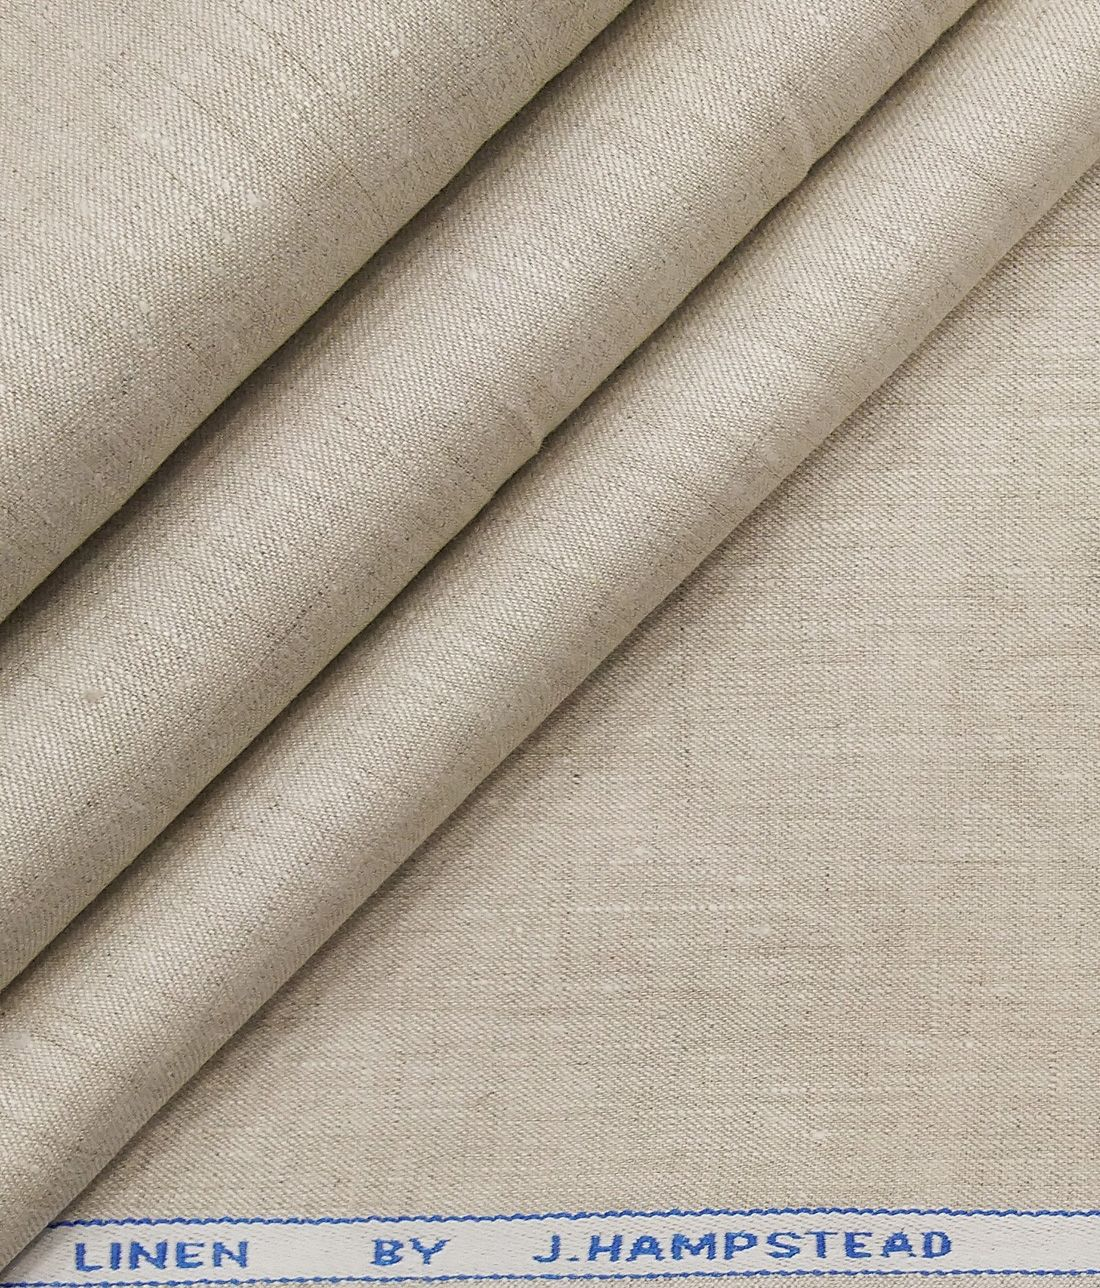 J Hampstead Men S Tan Beige 60 Lea 100 European Linen Solid Unstitched Suiting Fabric Fabric Suit Fabric European Linens